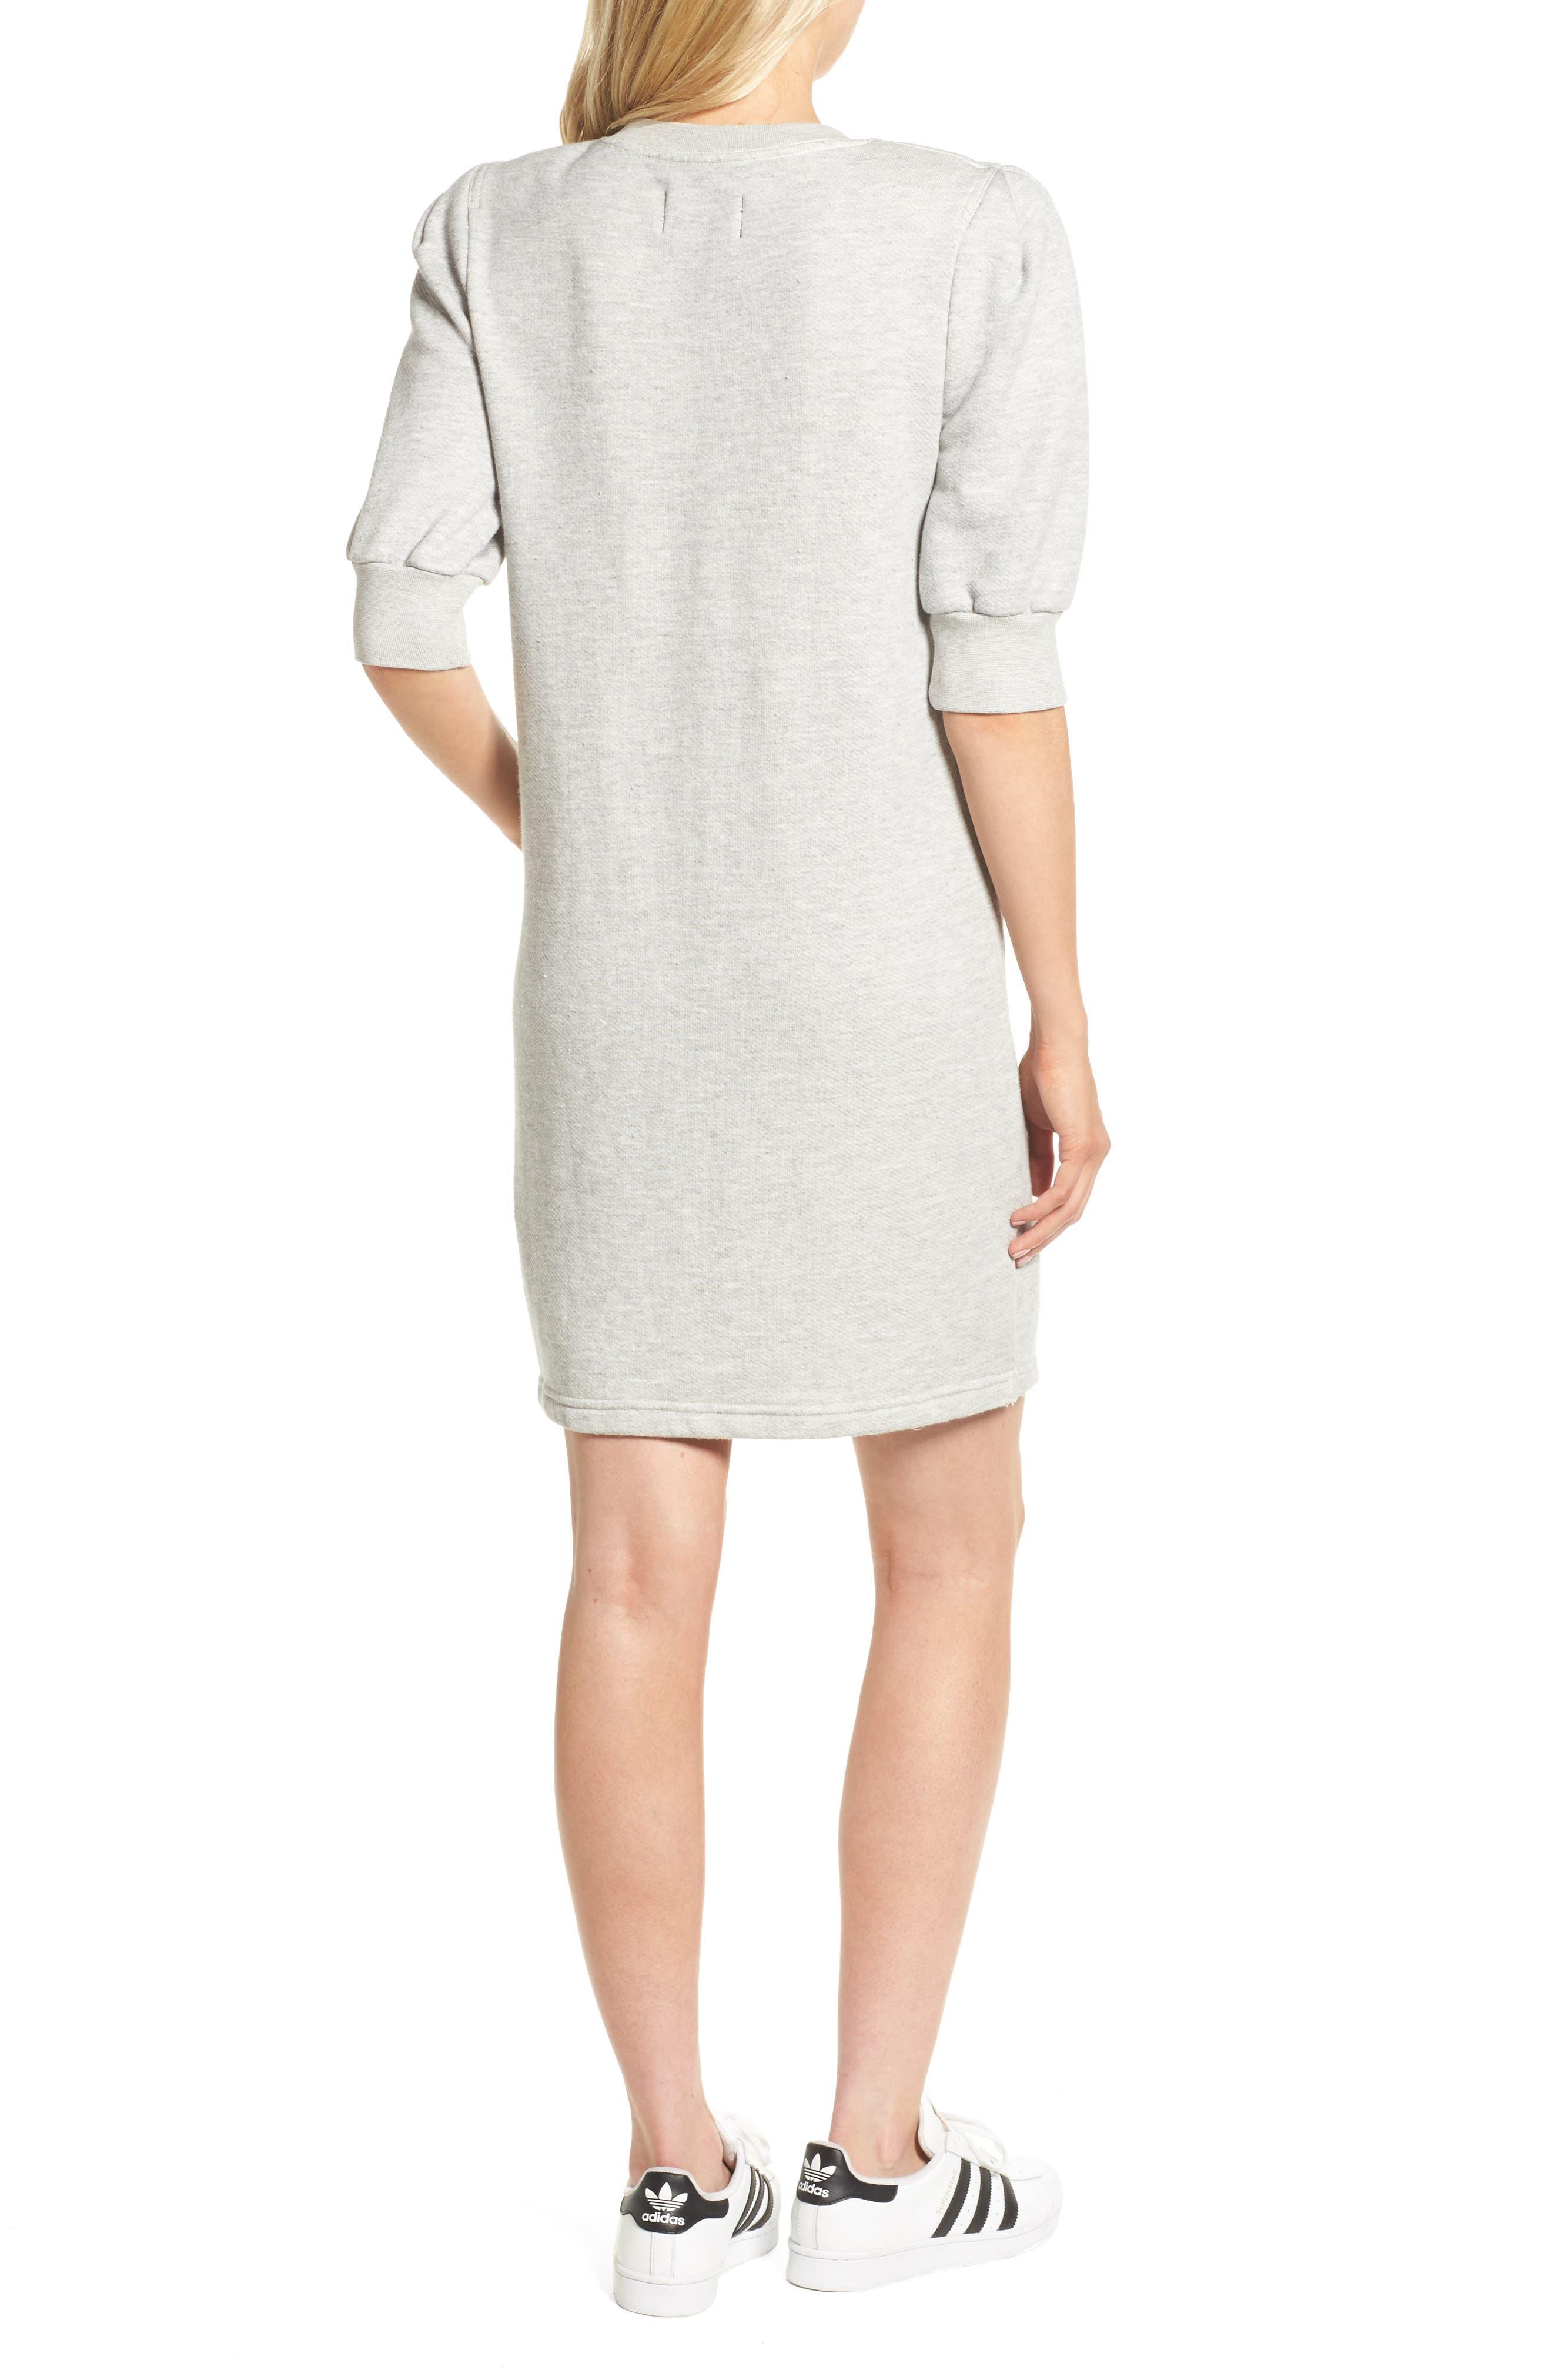 The Pleat Sweatshirt Dress,                             Alternate thumbnail 2, color,                             062